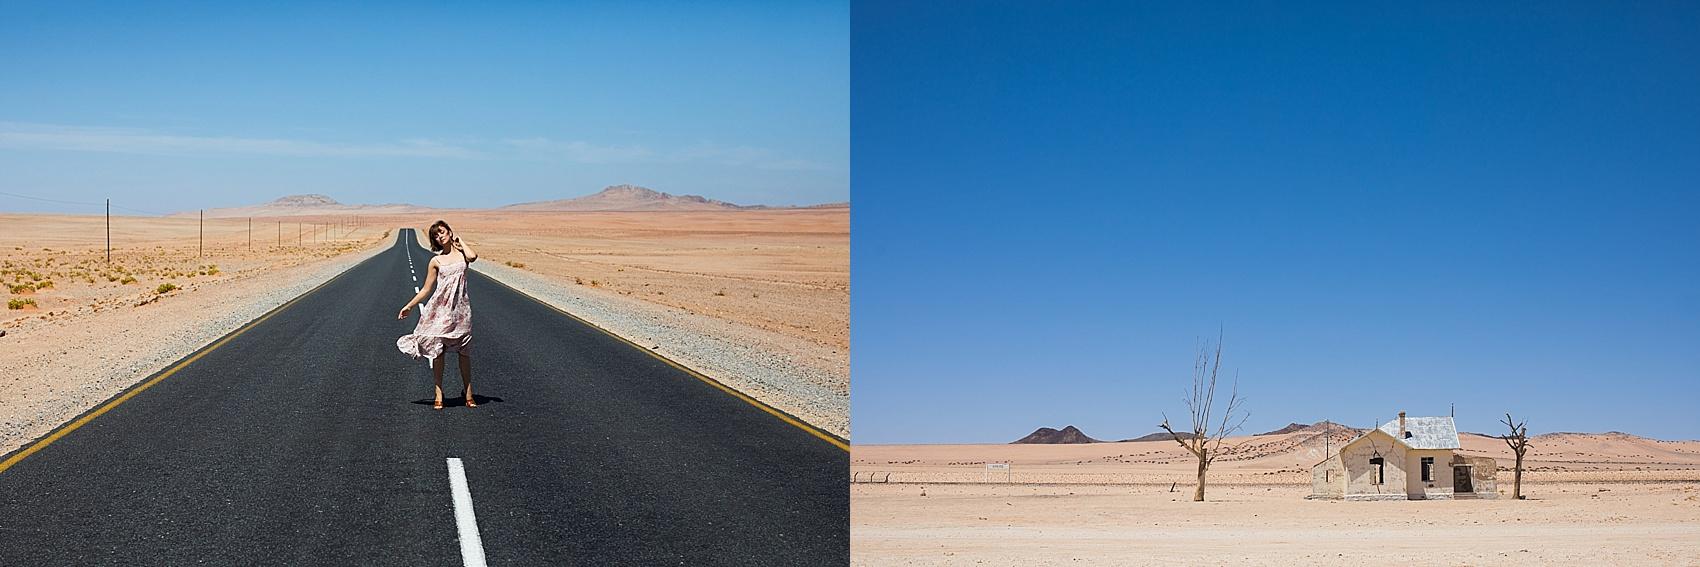 48_SABlog_Namibia.jpg